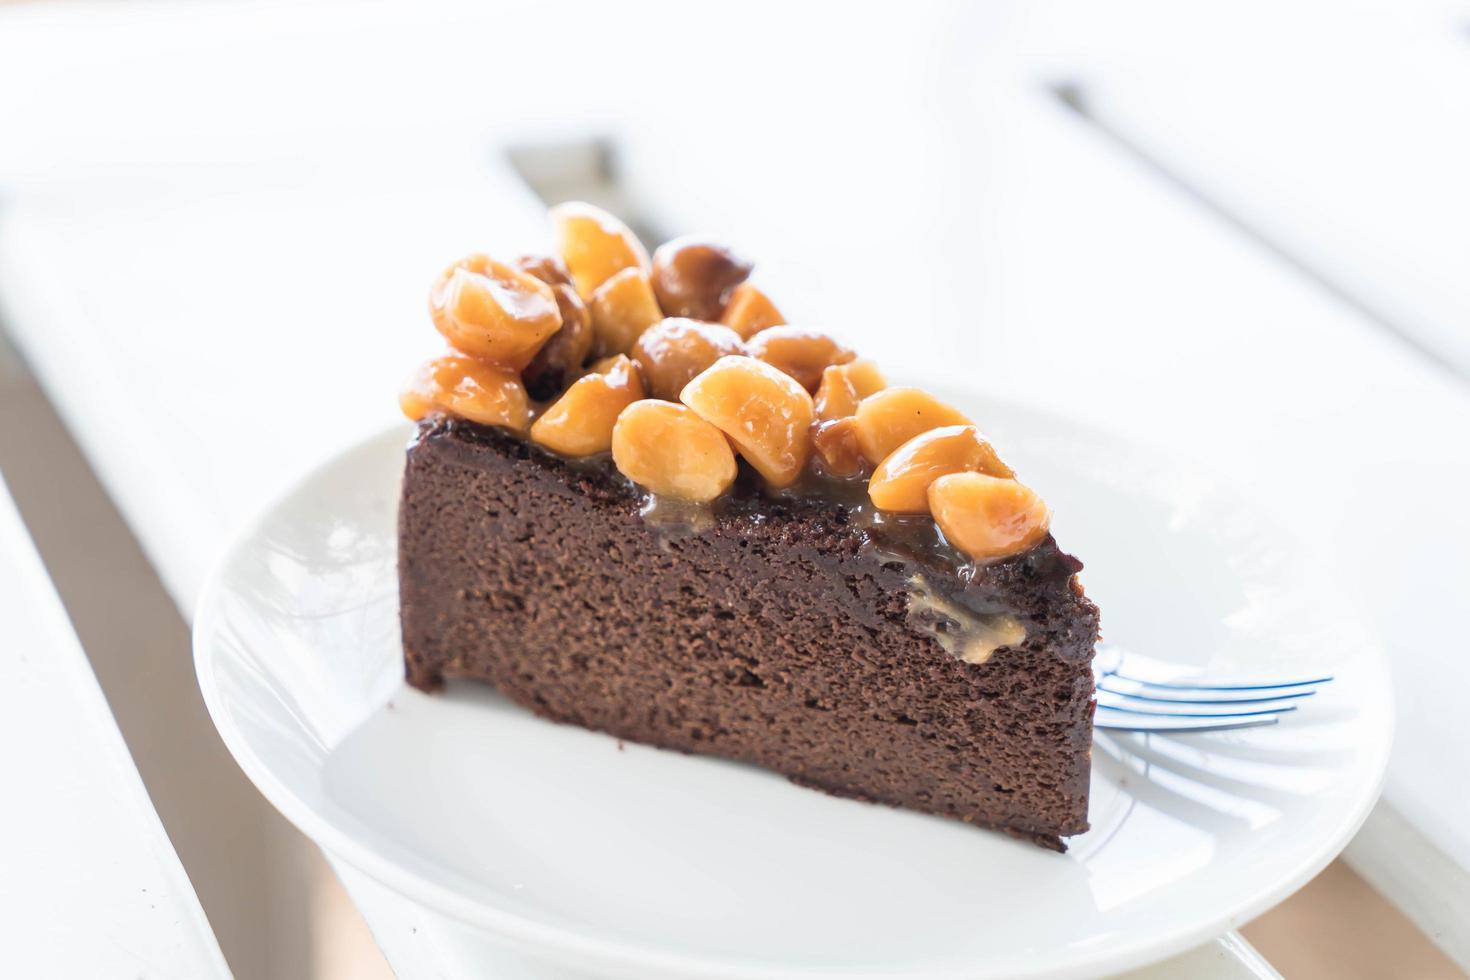 Gâteau au chocolat macadamia sur fond blanc minimal photo